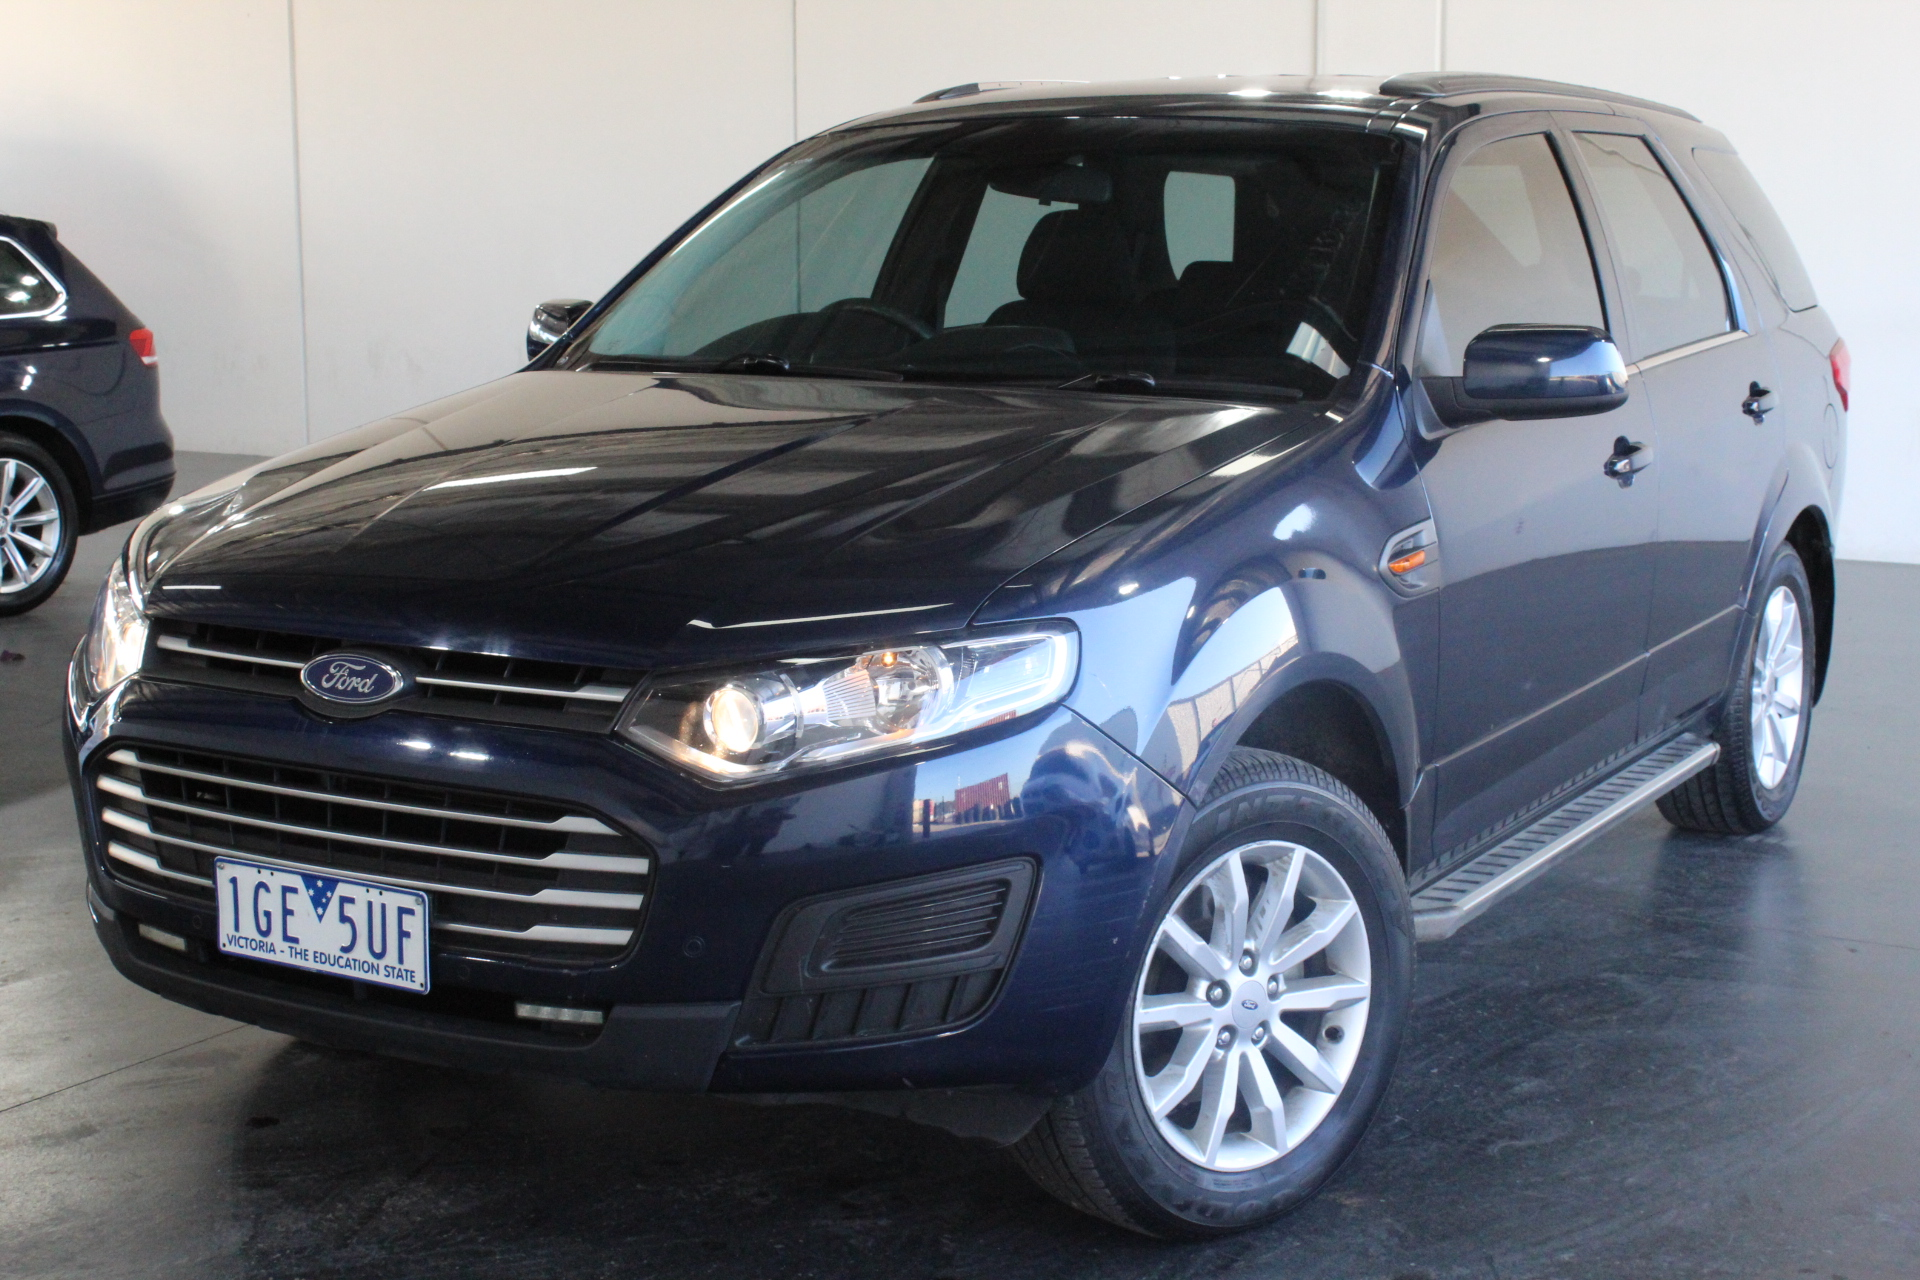 2014 Ford Territory TX (RWD) SZ II Automatic Wagon